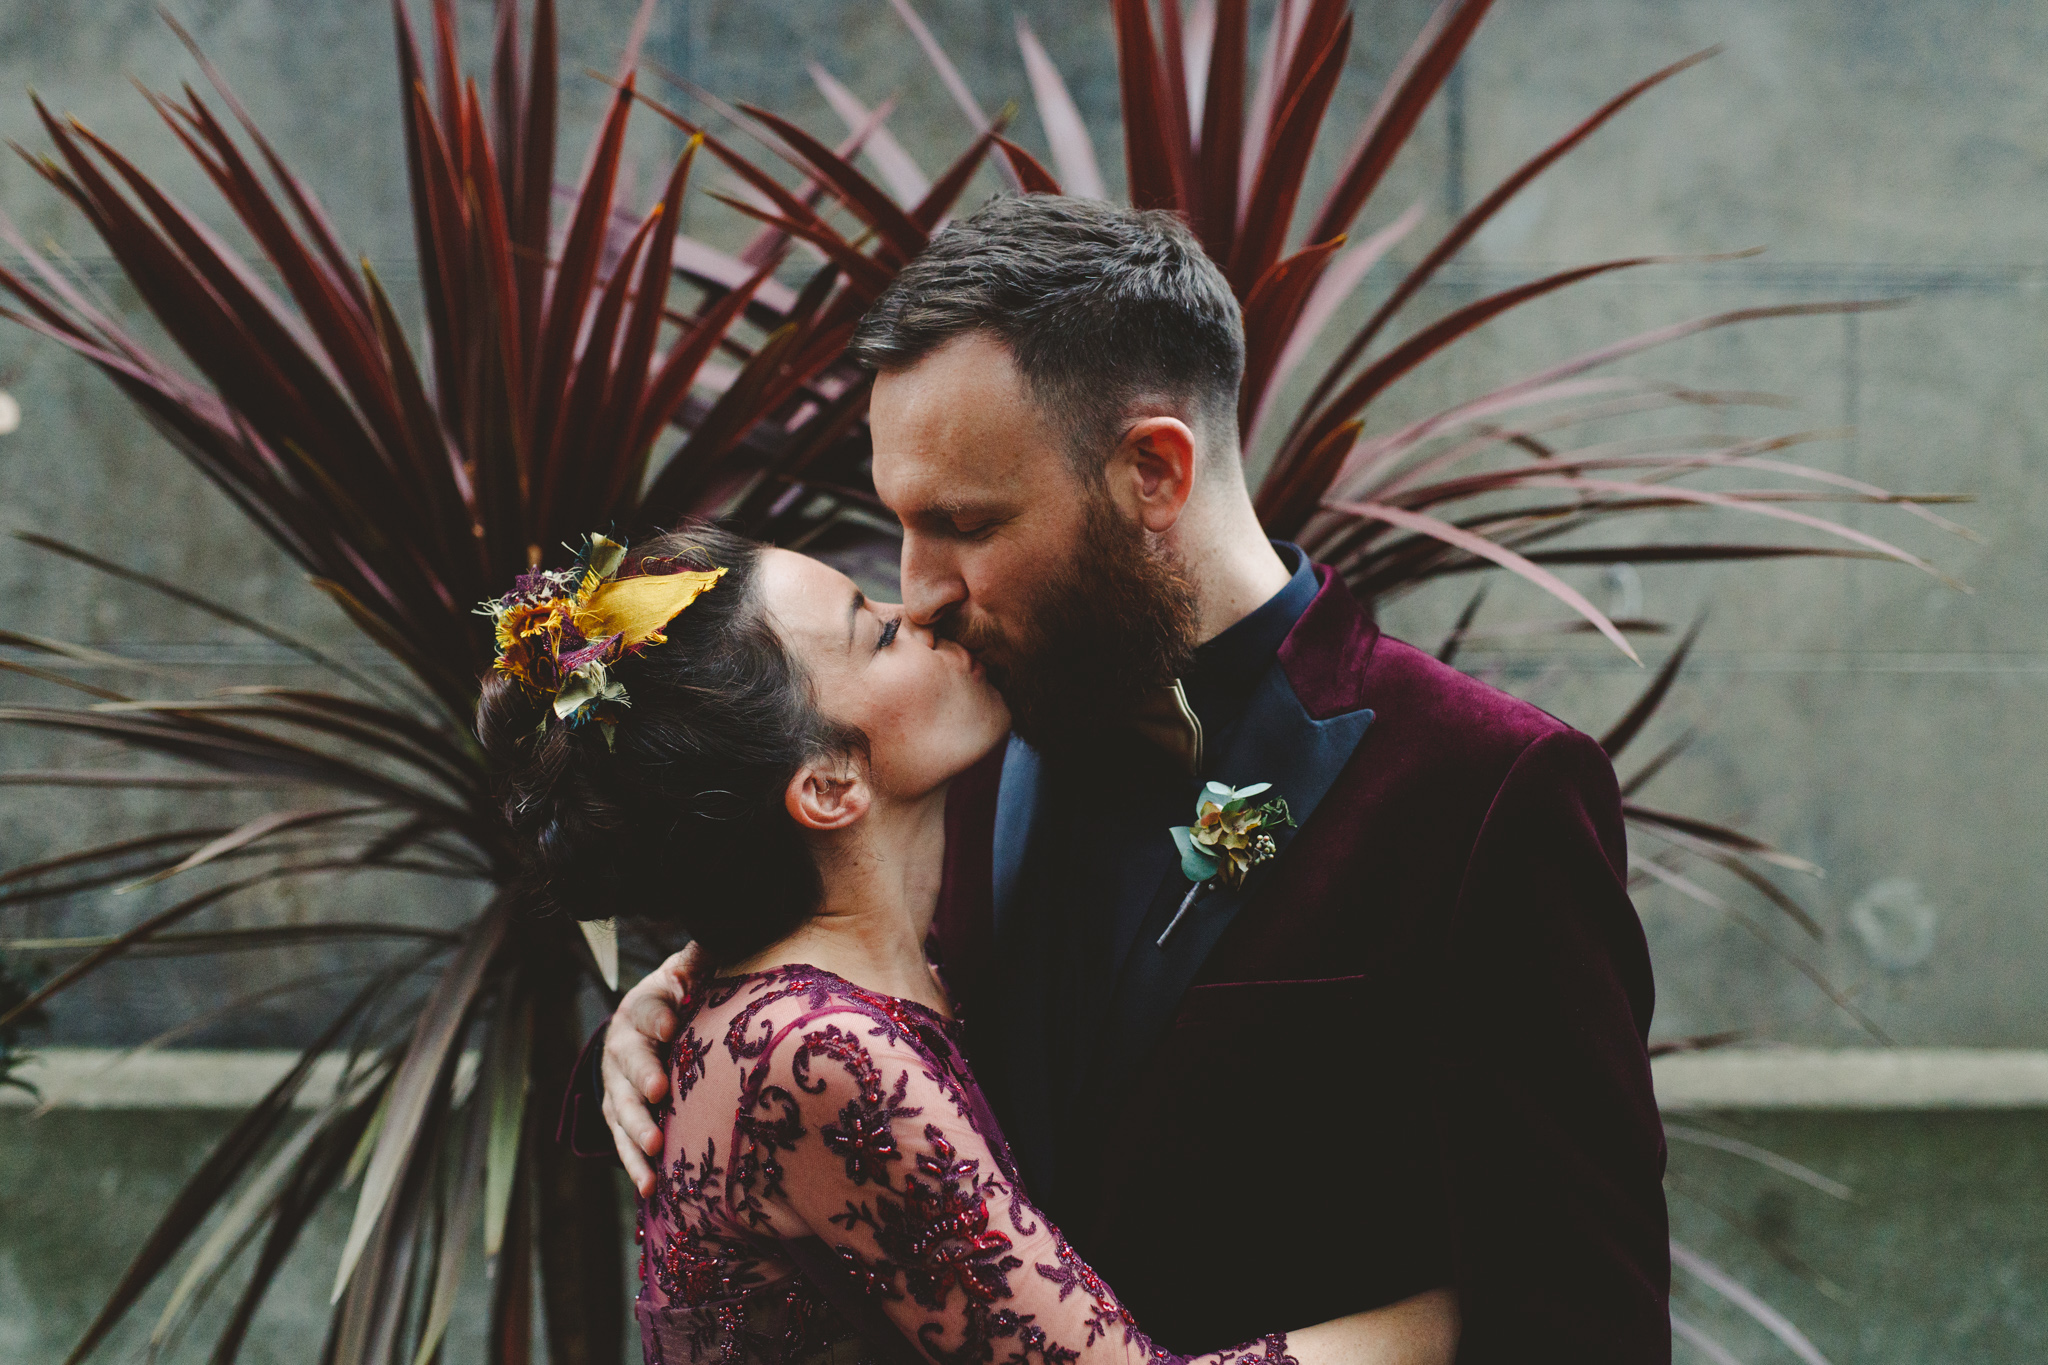 derbyshire-wedding-photographer-october-november-7.jpg